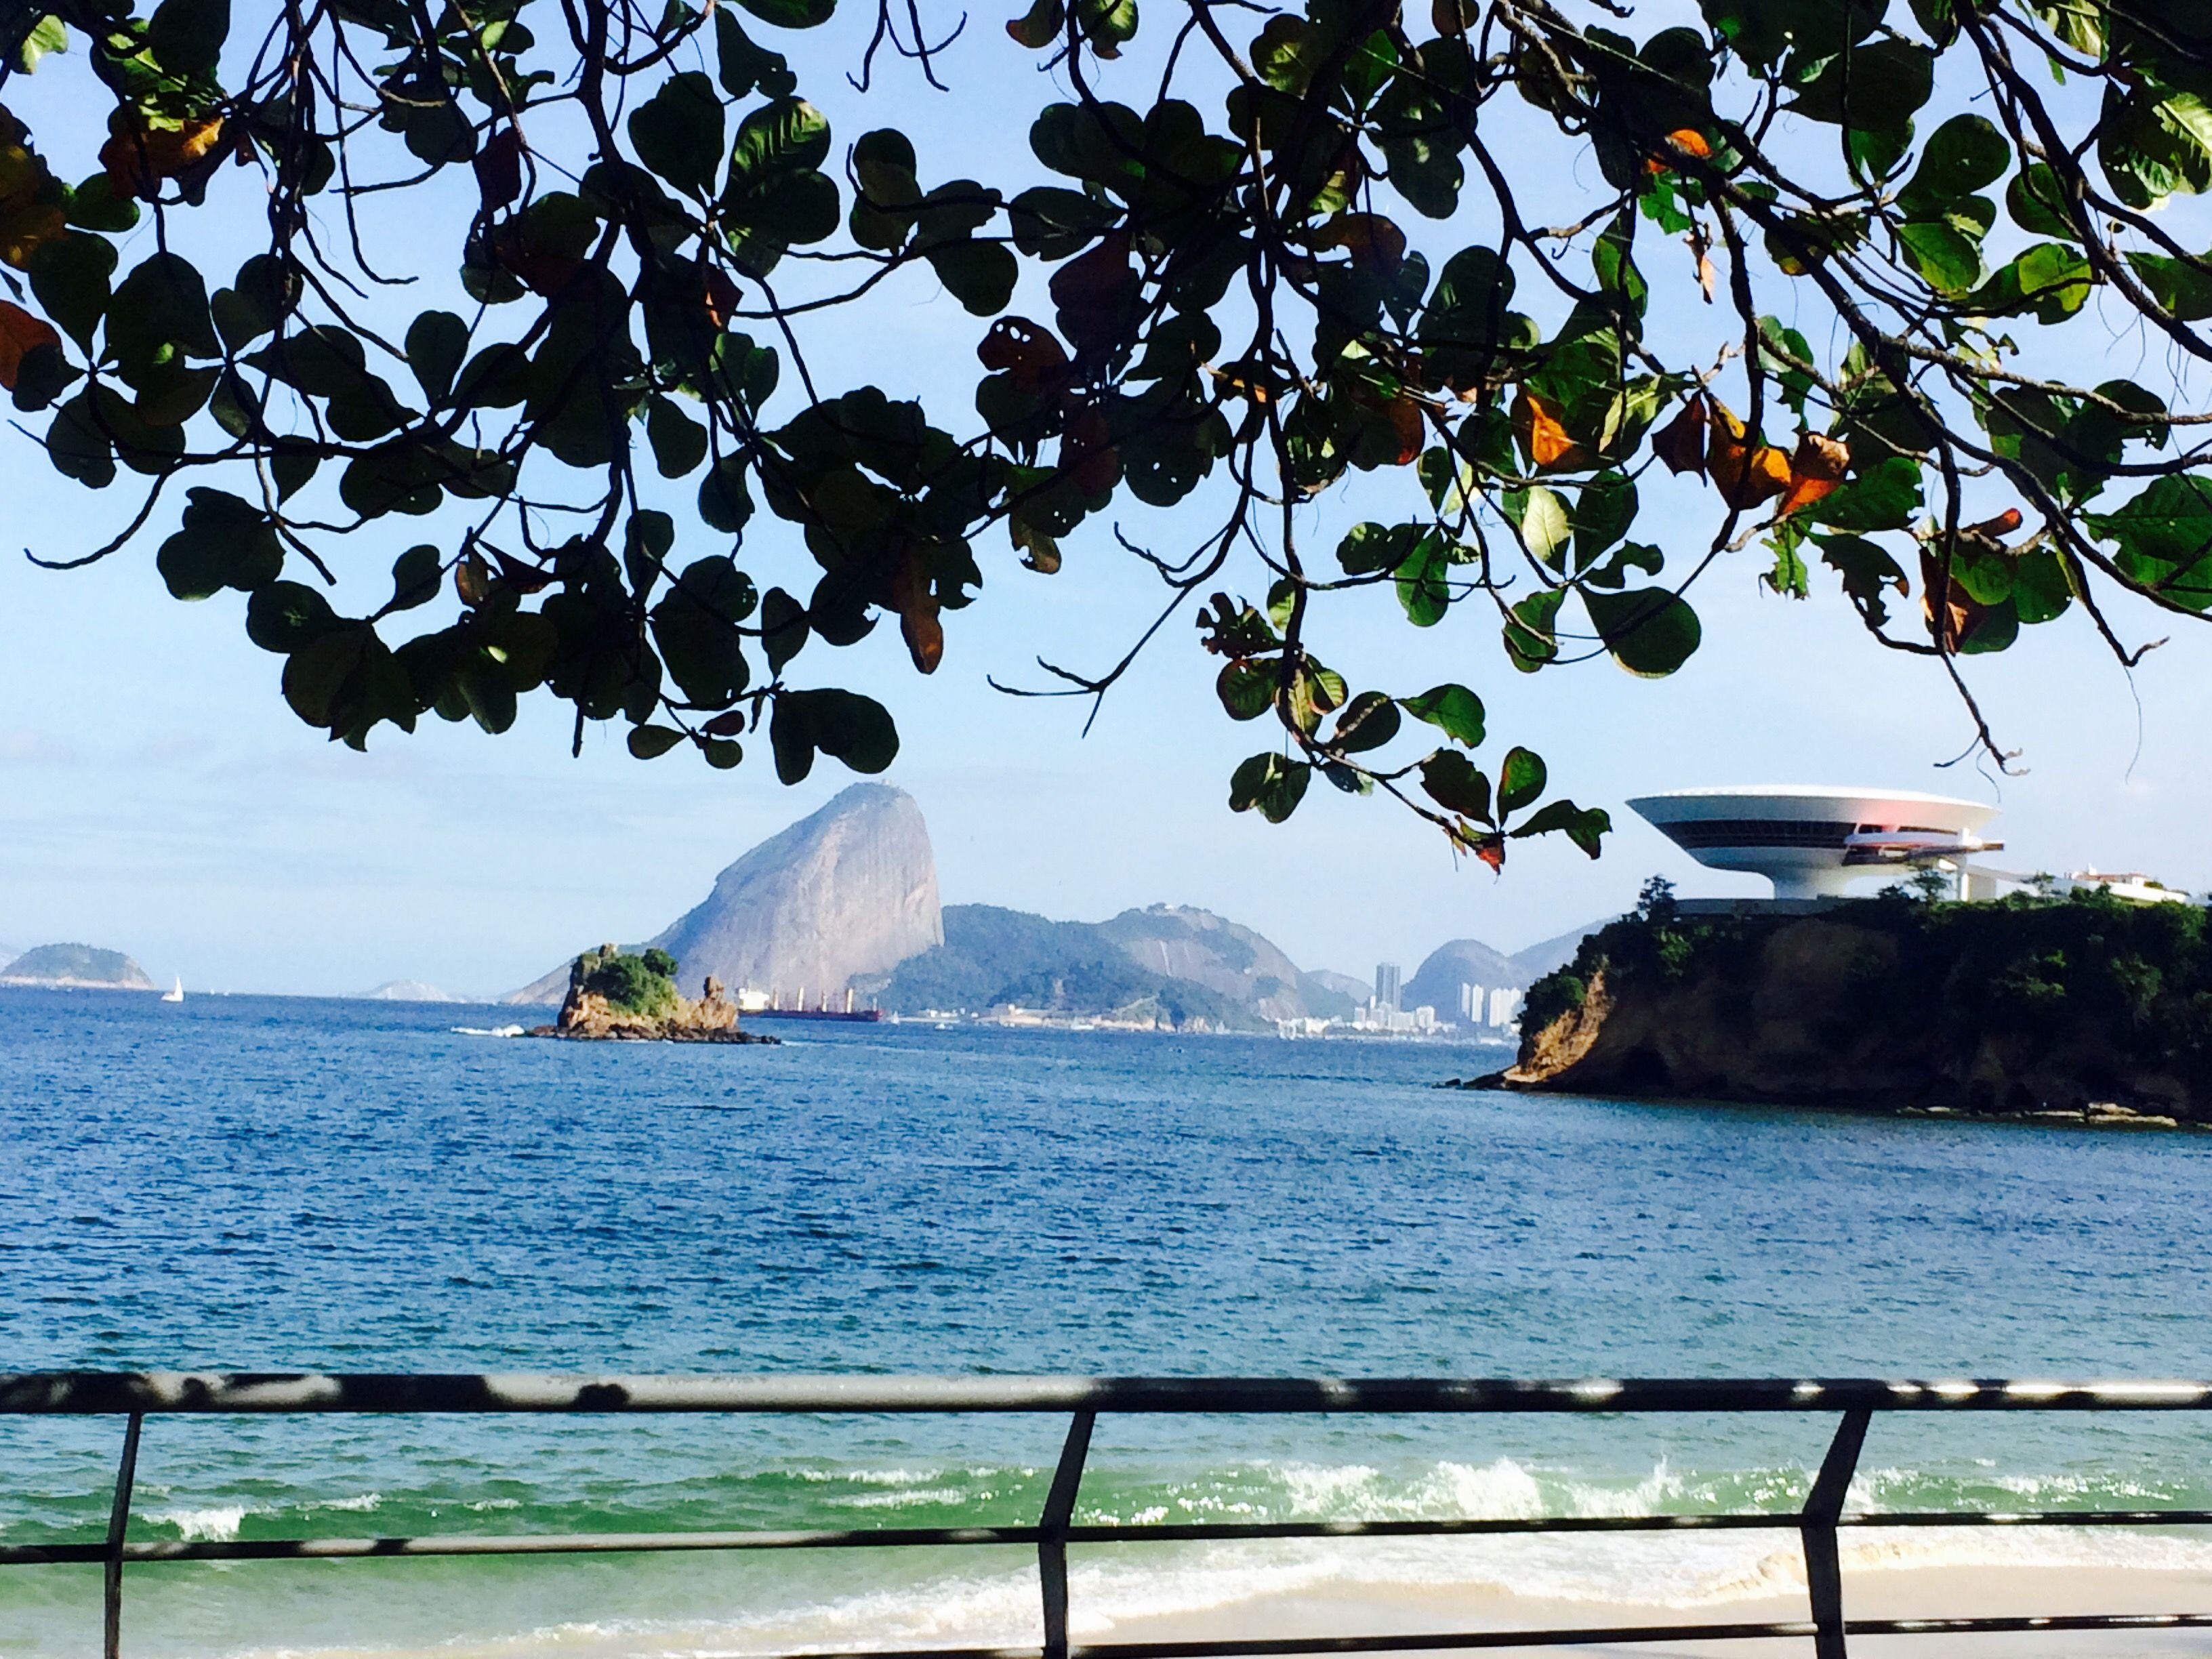 Praia de Acarai, Niterói, Rio de Janeiro